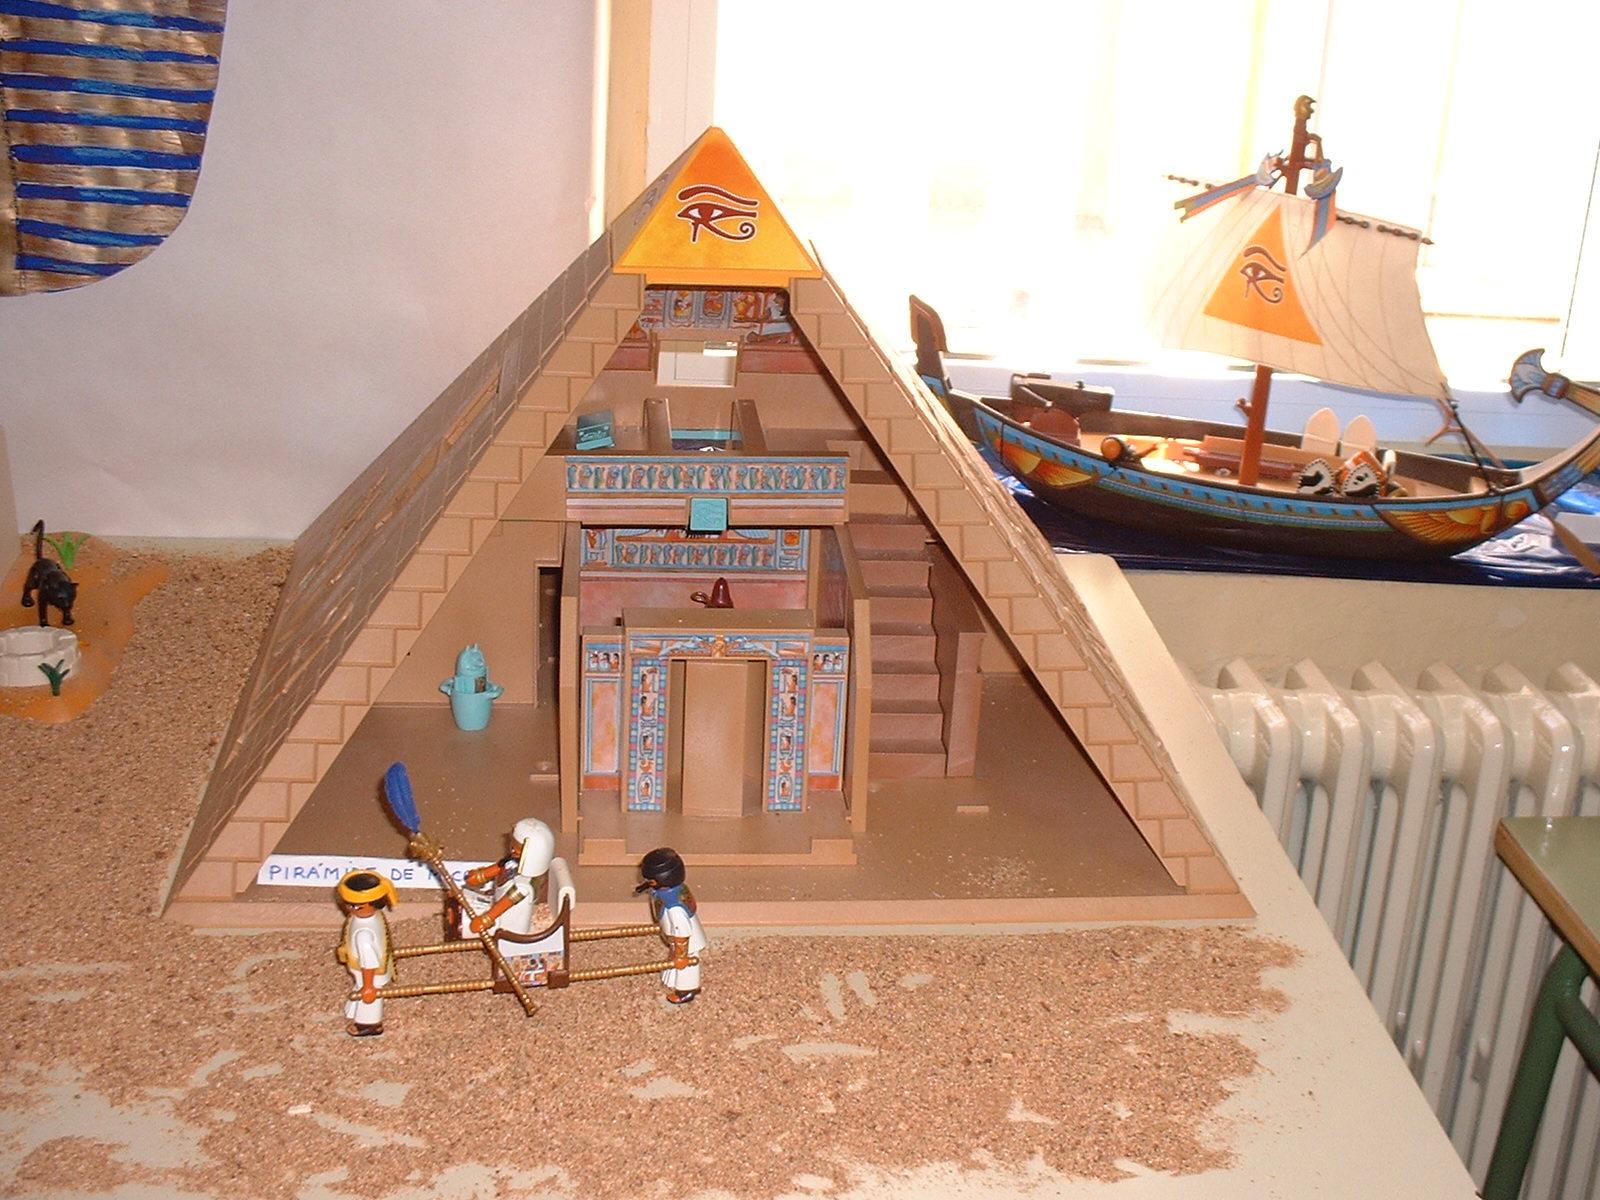 maqueta de egipto imagenes apexwallpapers